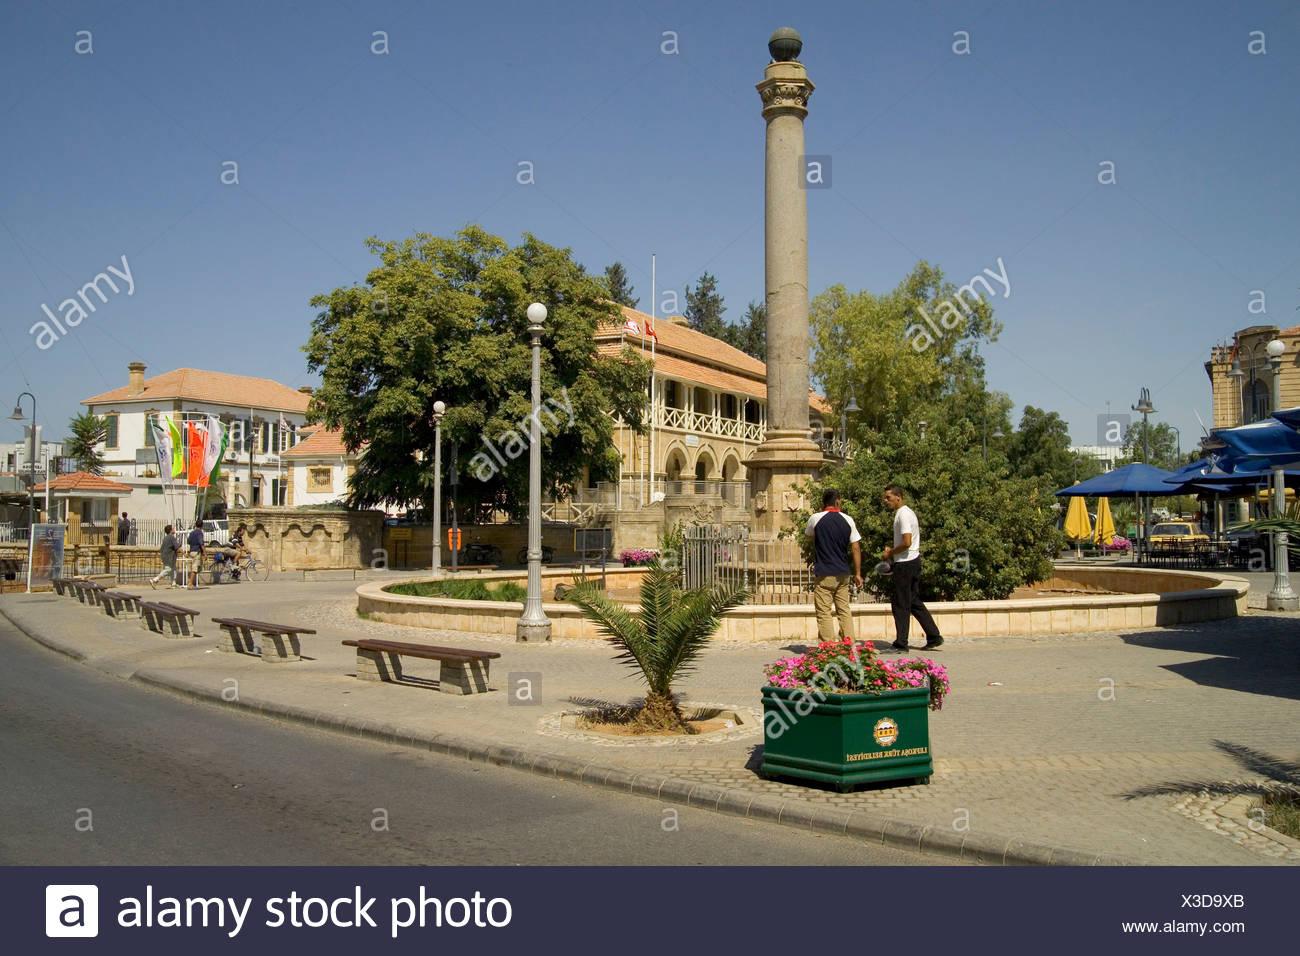 Northern Cyprus, Nicosia. Attractions, recreation 63